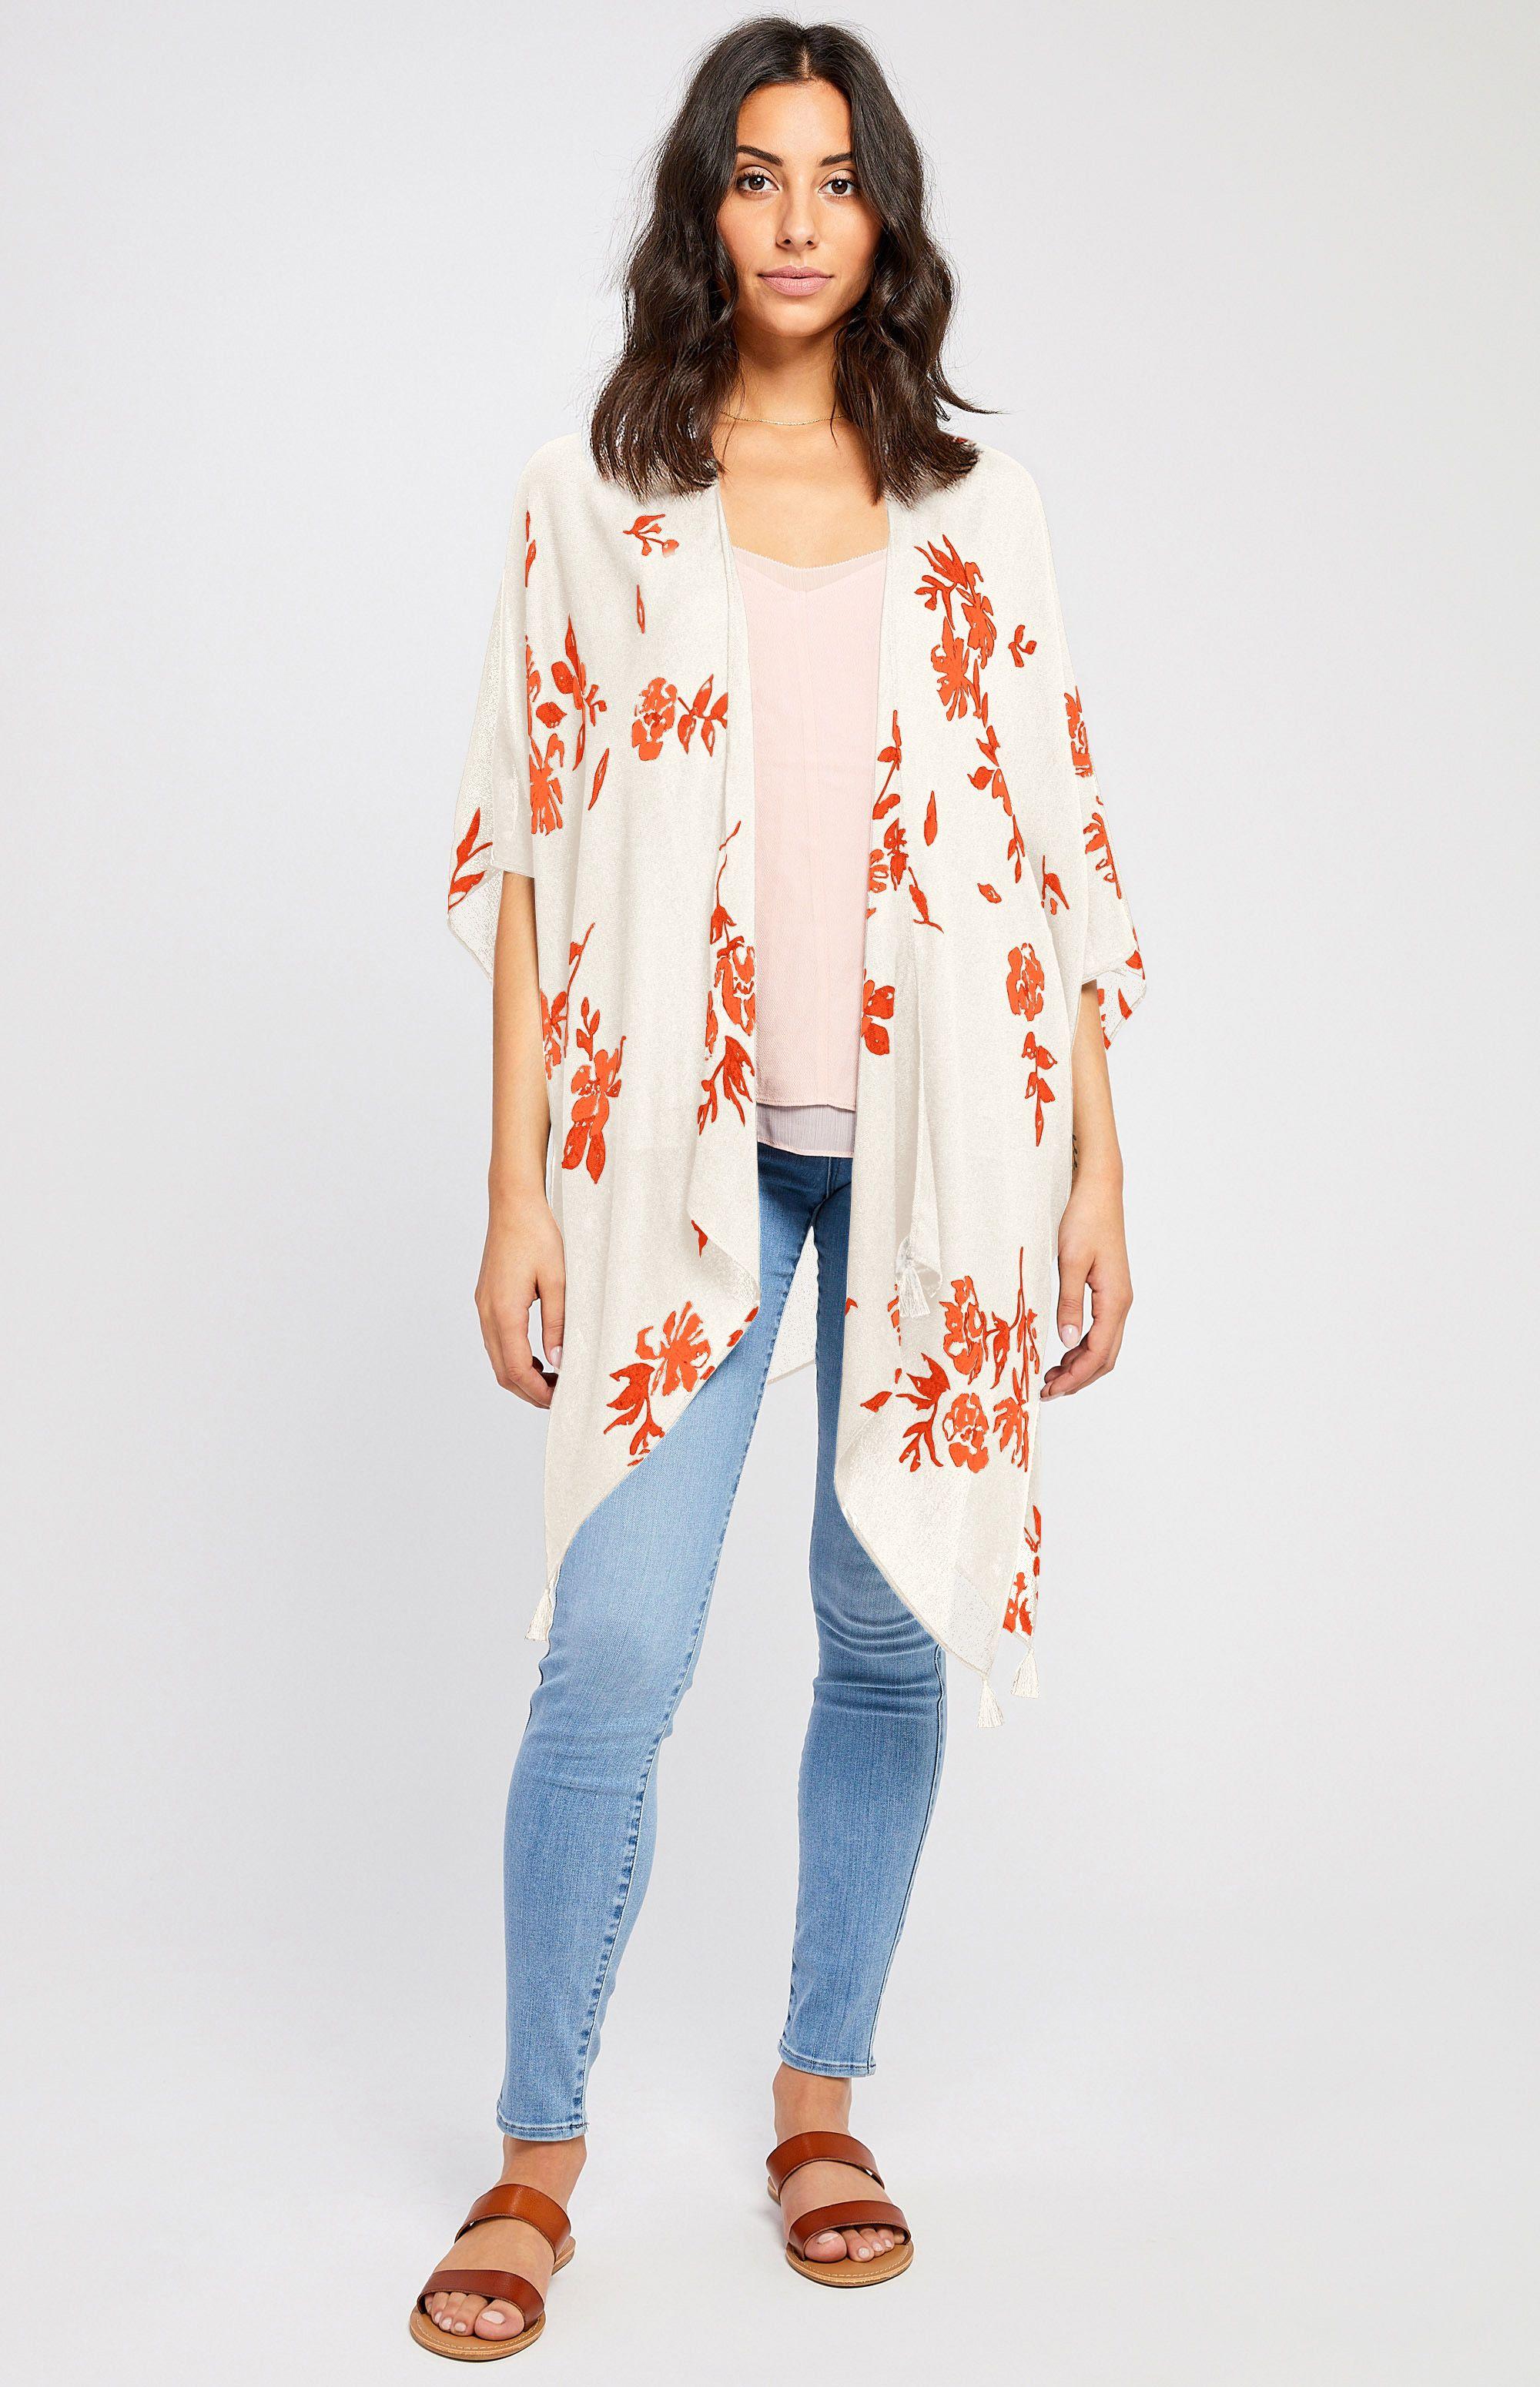 8b4dcdfe0 The Heron Kimono | Spring 2019 Collection in 2019 | Kimono, Floral ...